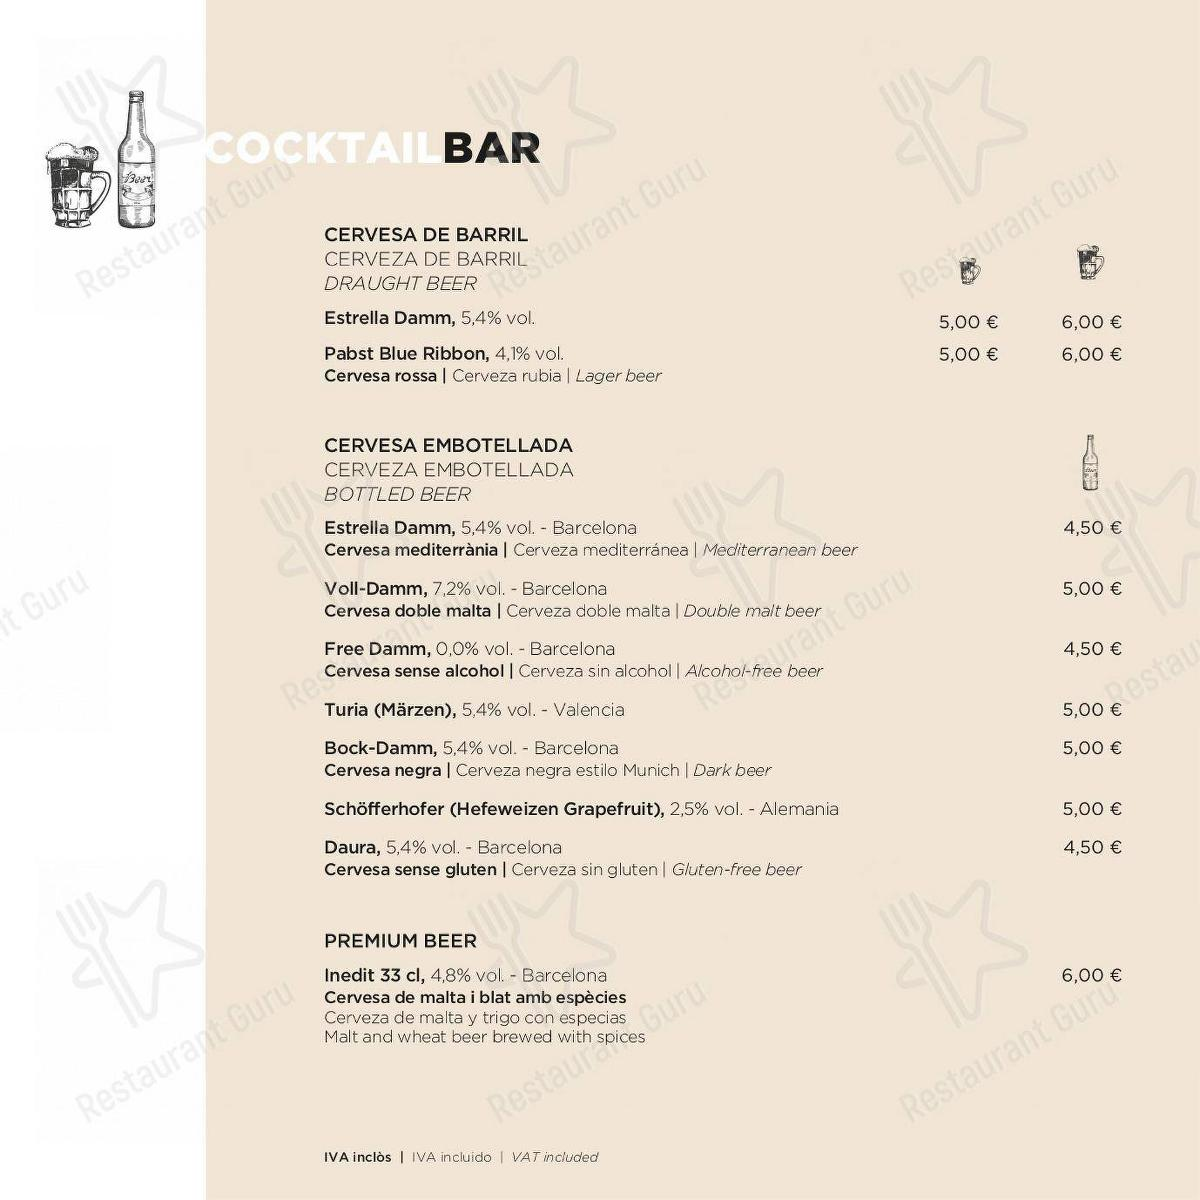 ECHO Restaurant in Barcelona - Cocktail Bar menu